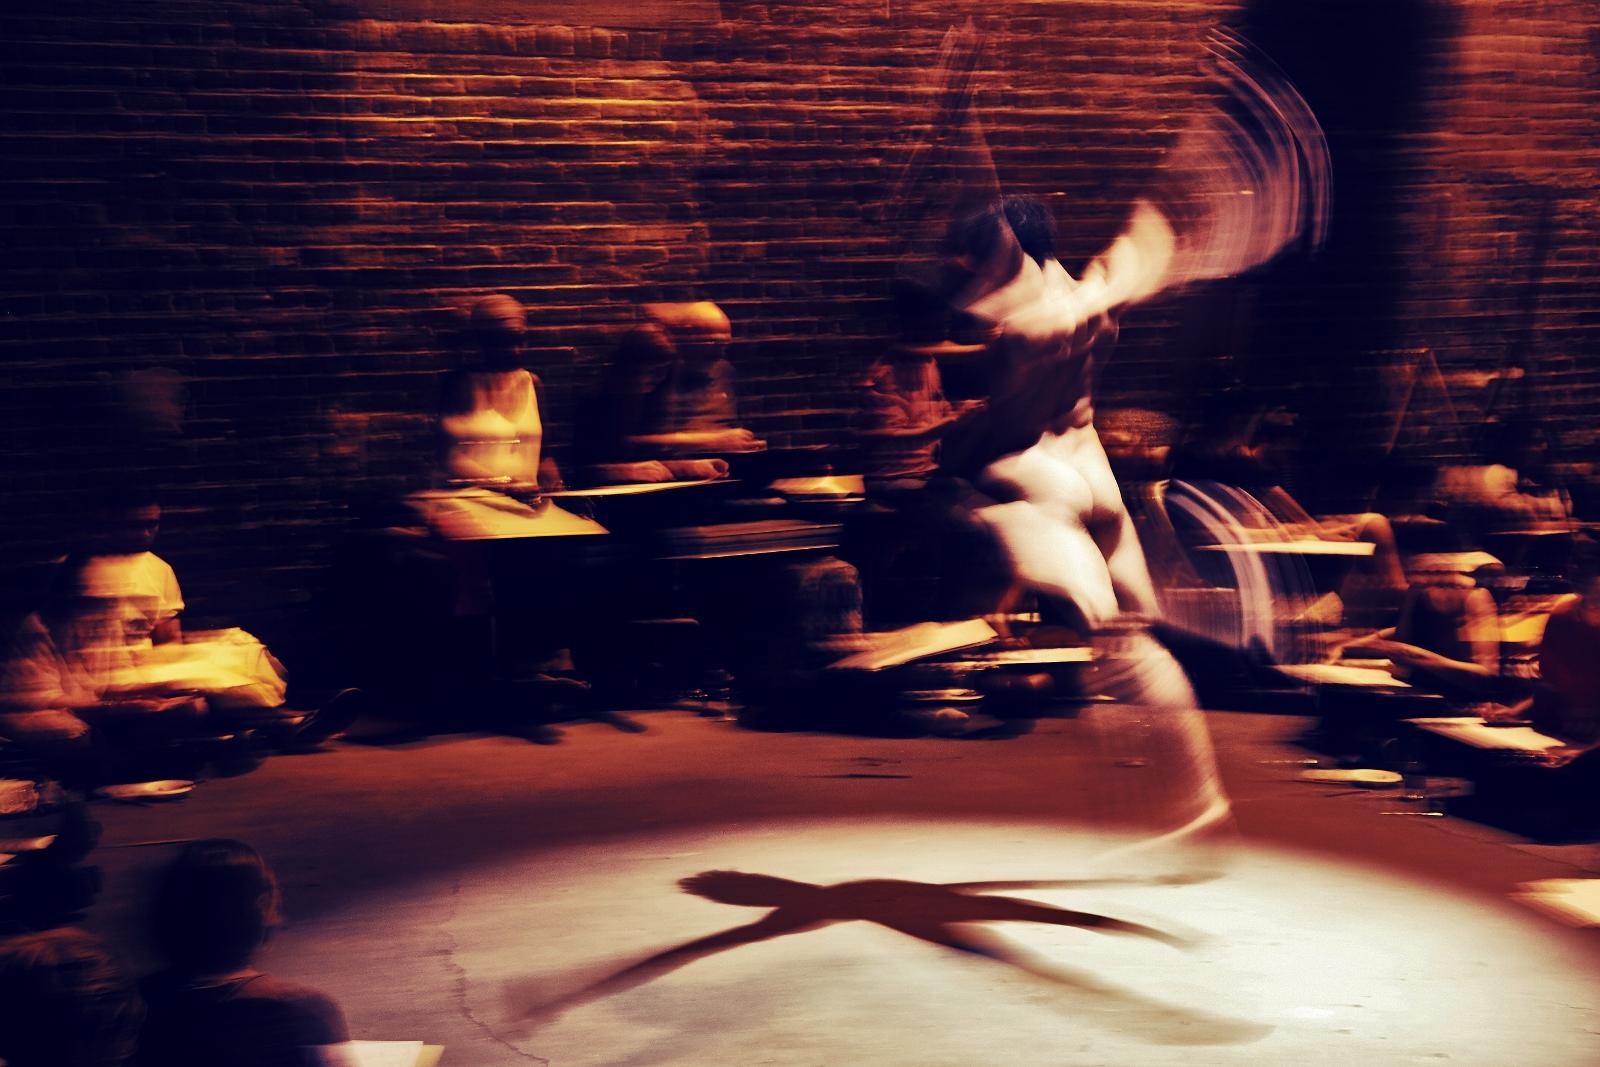 Dance (Pic by Ila Brugal - brugalila.tumblr.com).jpg